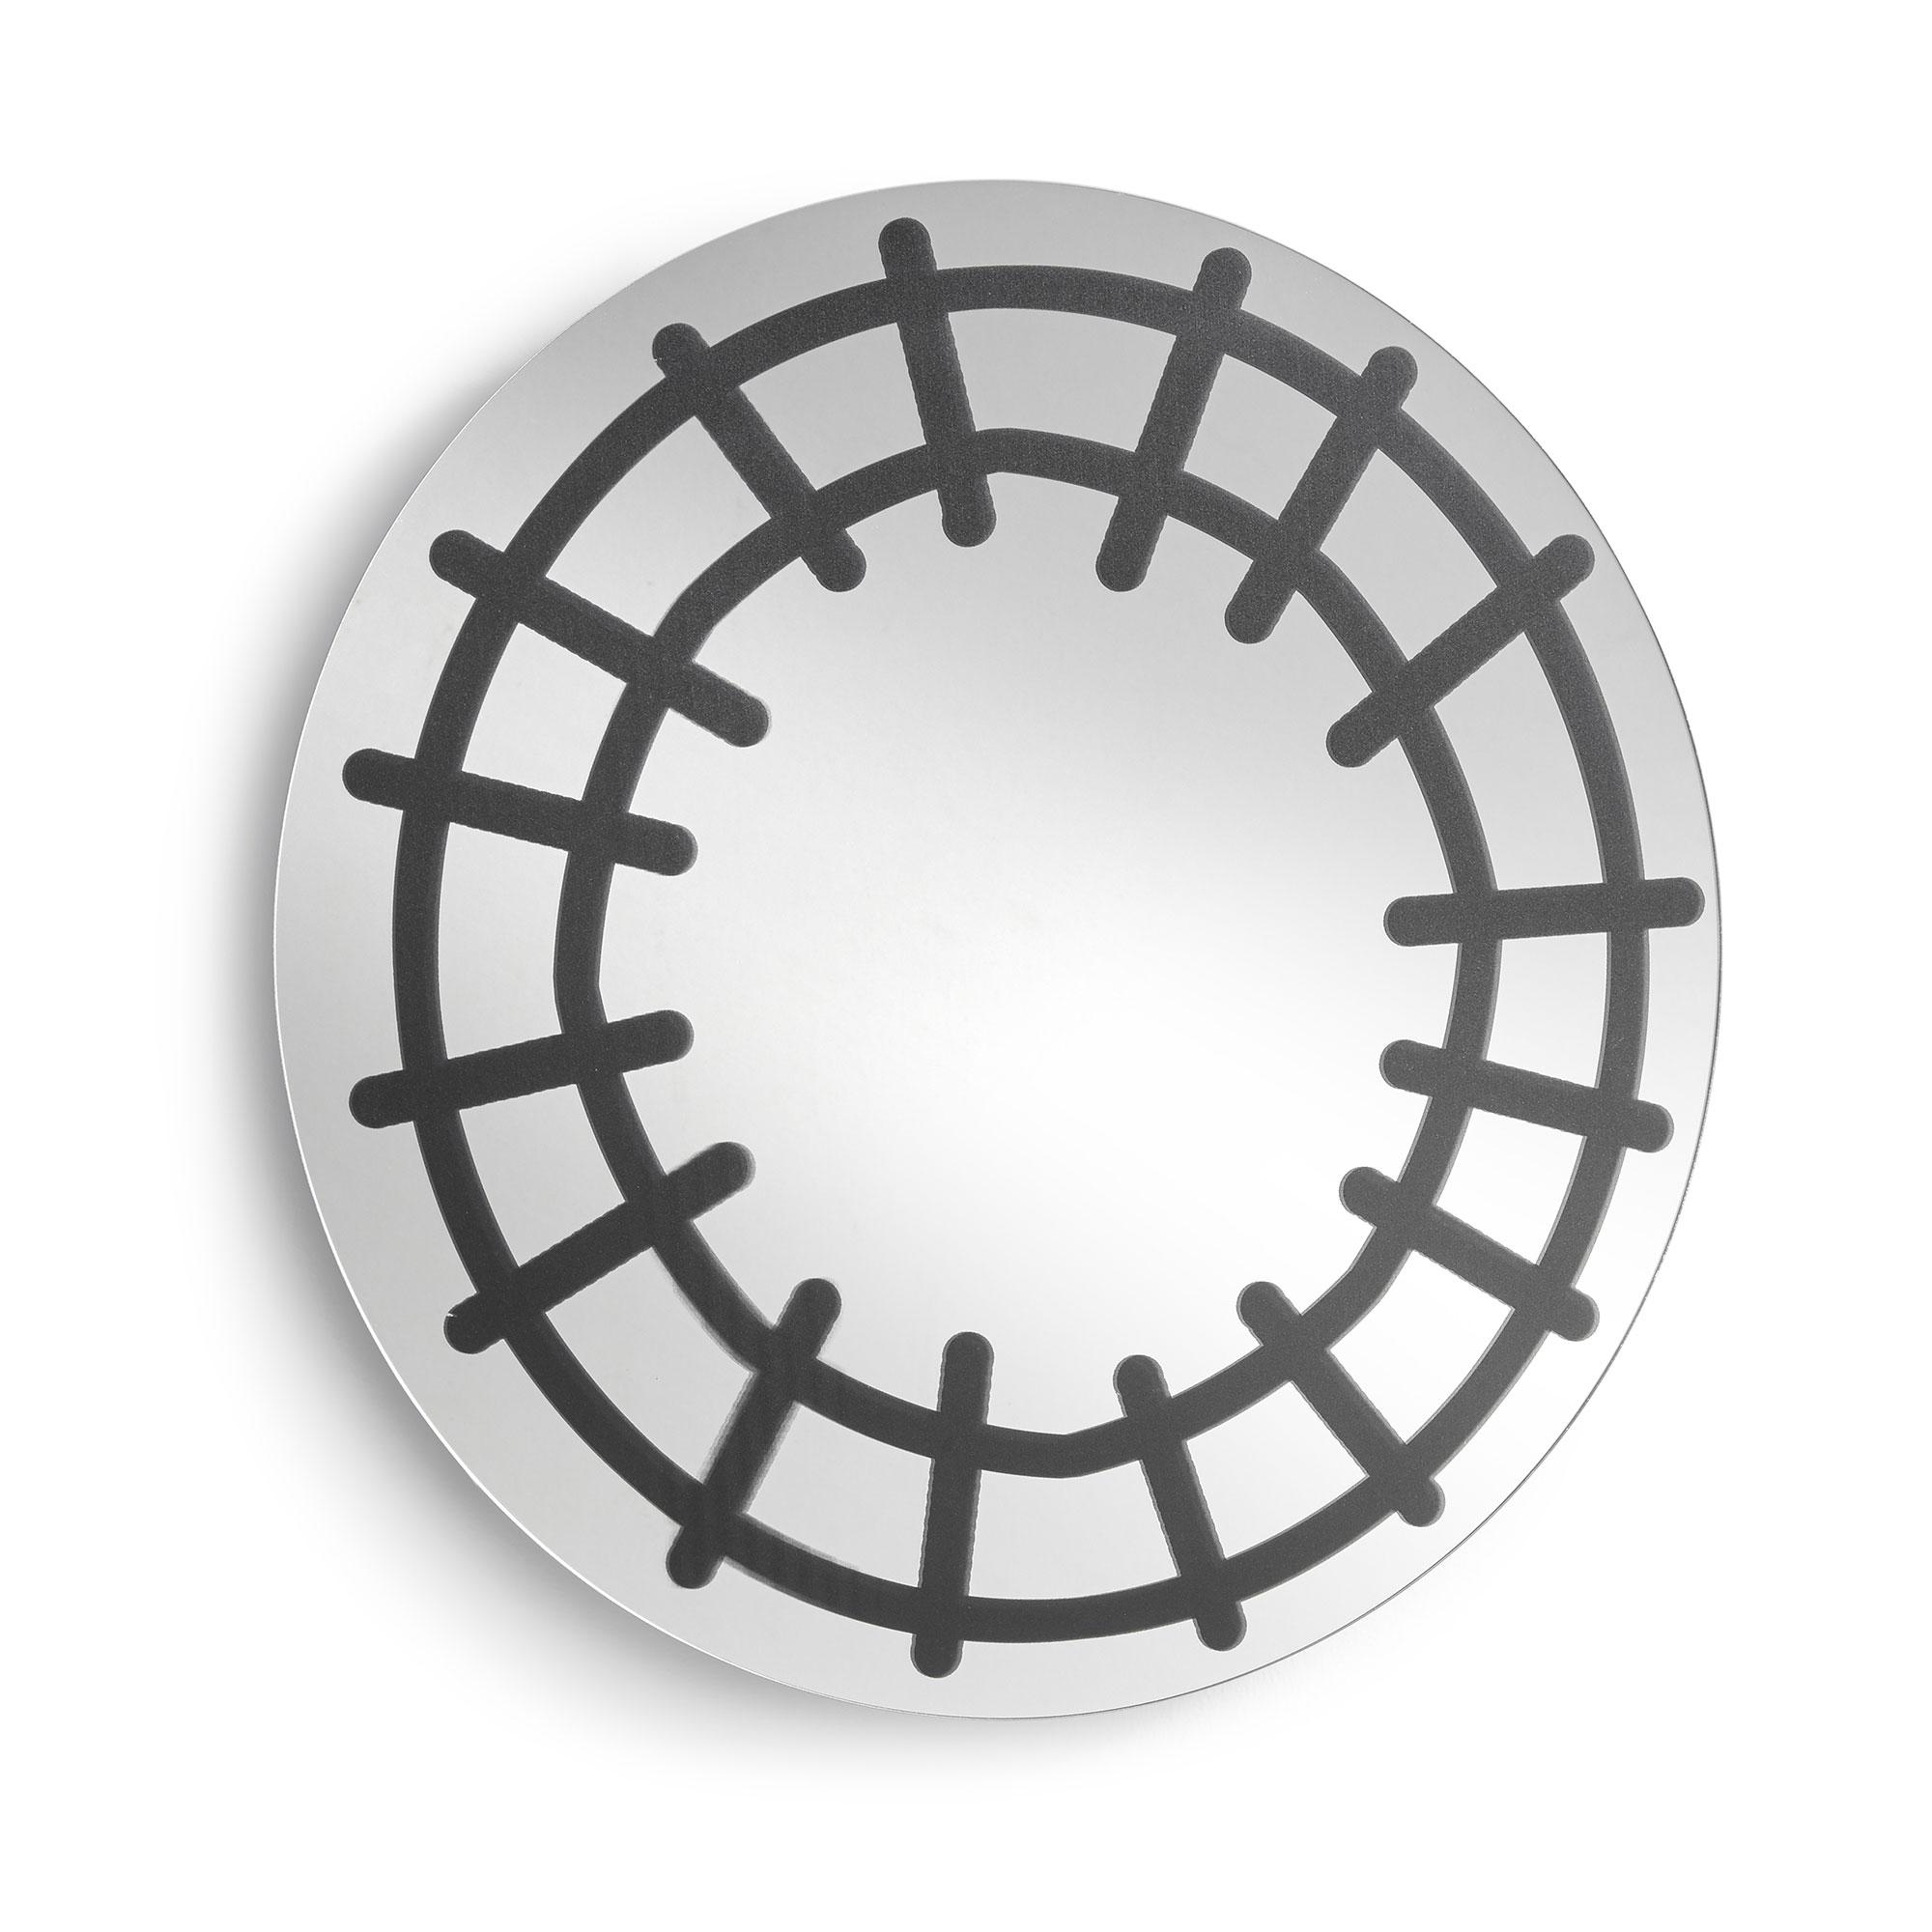 LaForma ronde spiegel 'Chantel', kleur Zwart